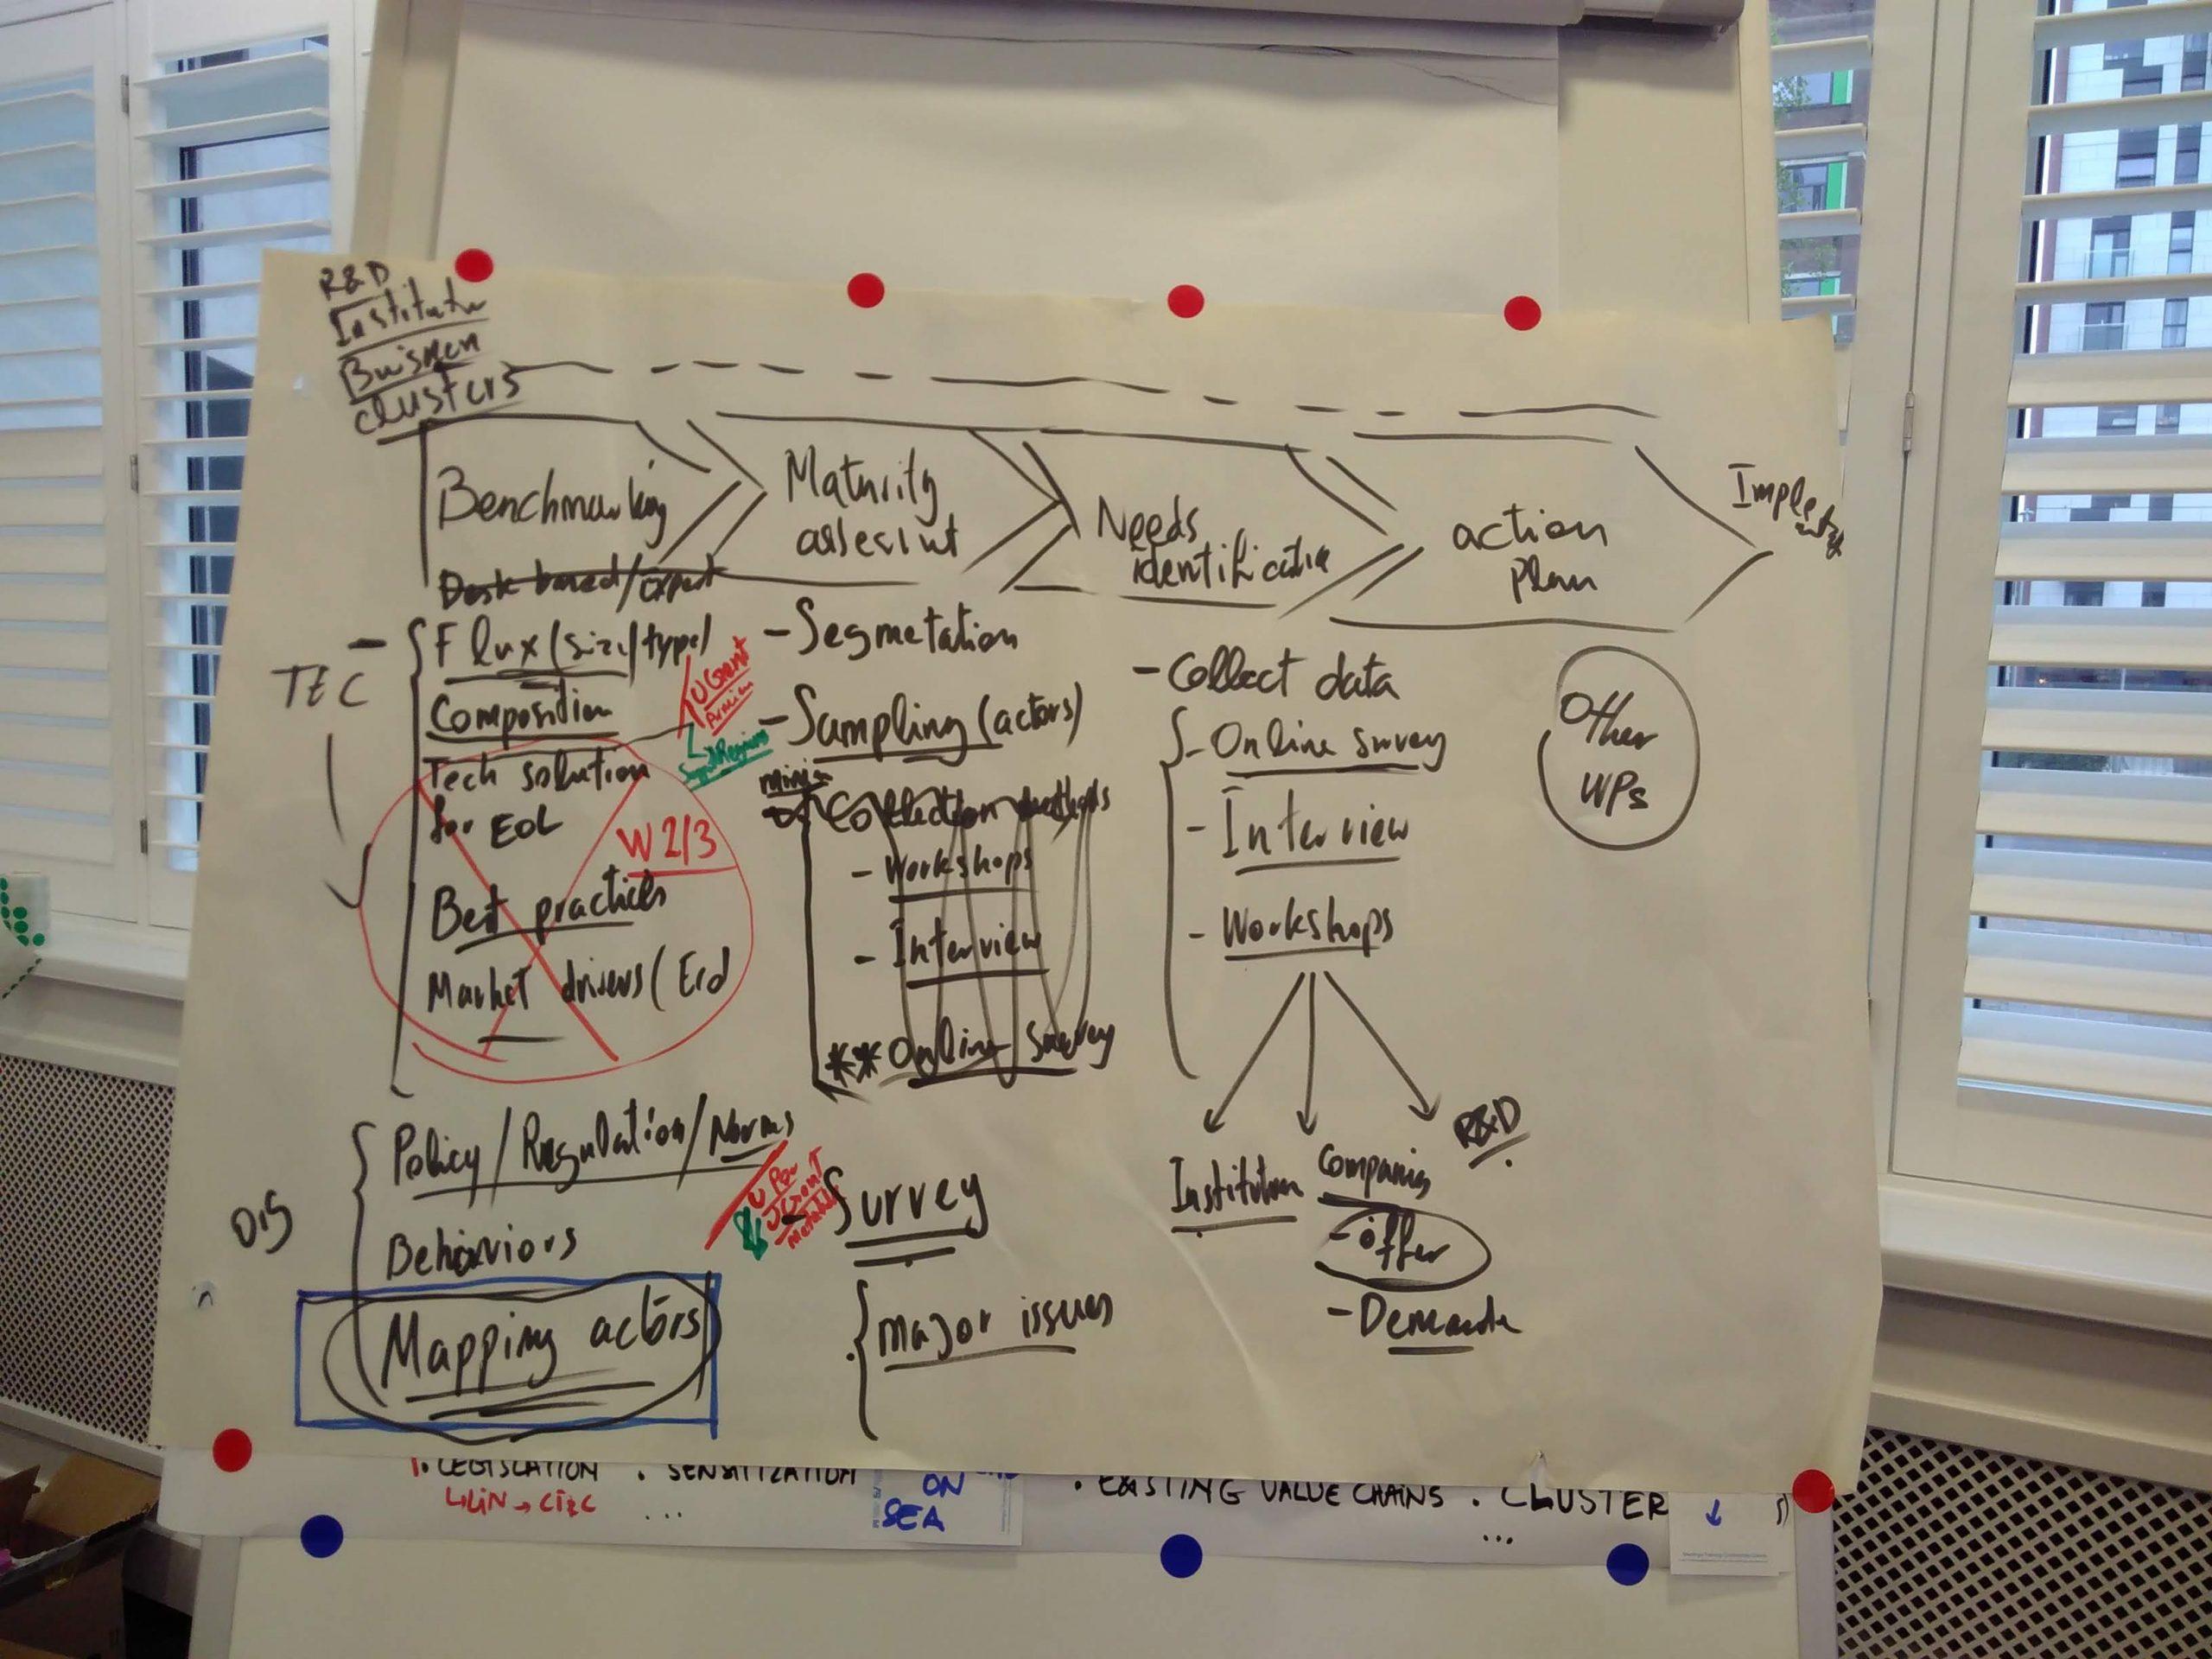 work package planning